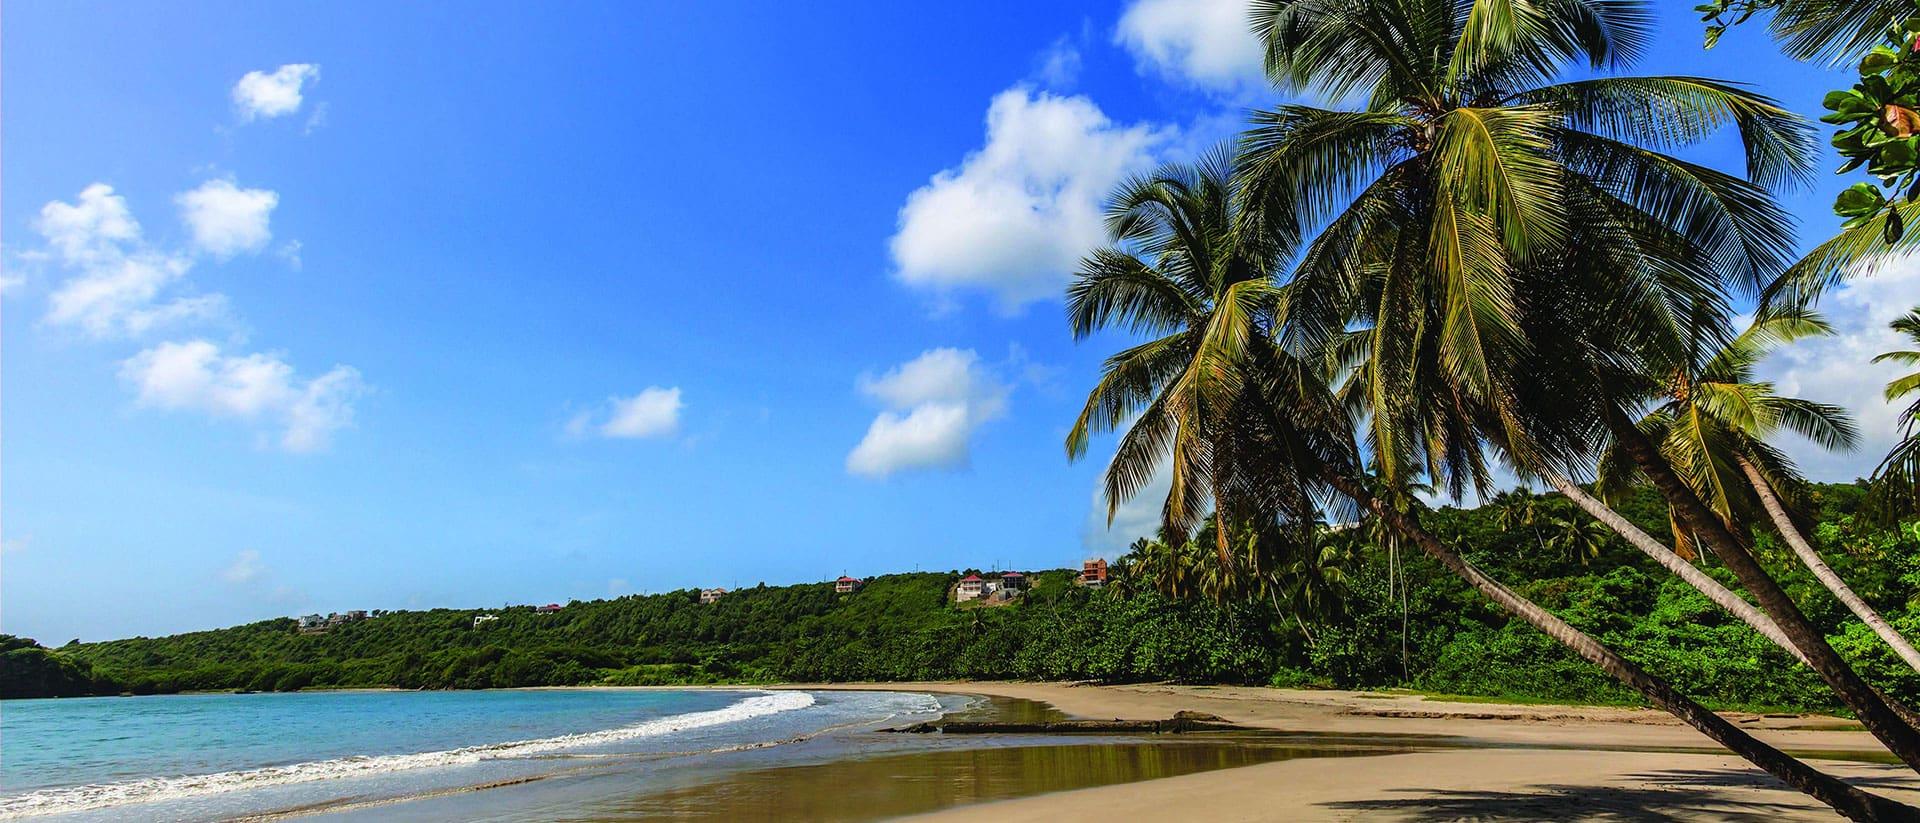 Bất động sản Six Sences Grenada - Caribe